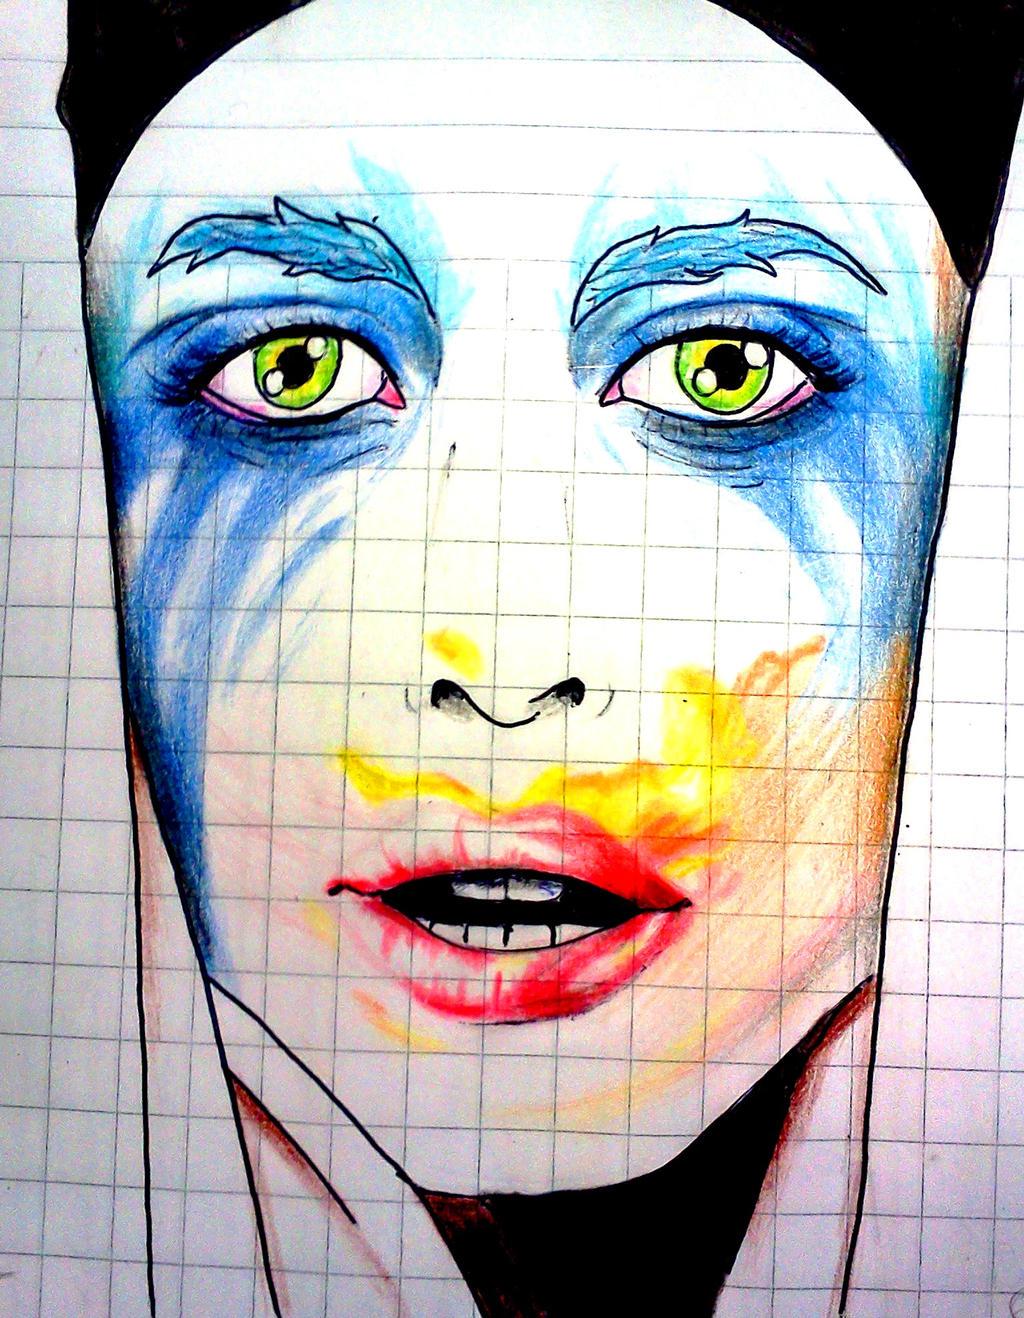 Lady Gaga - Applause by VictorGago on DeviantArt